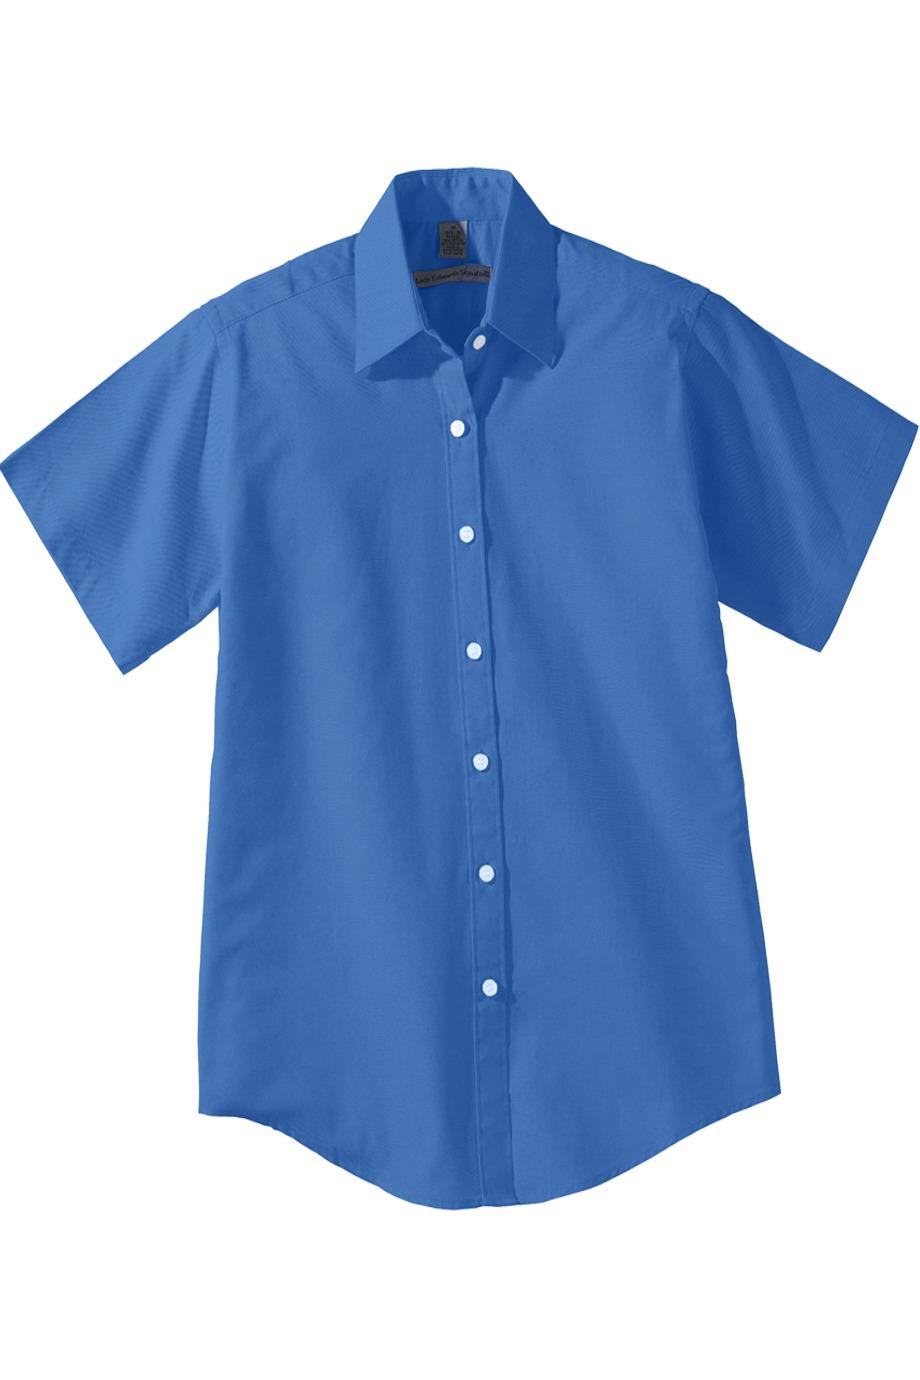 Edwards Garment 5925 - Women's Short Sleeve Pinpoint Oxford Shirt